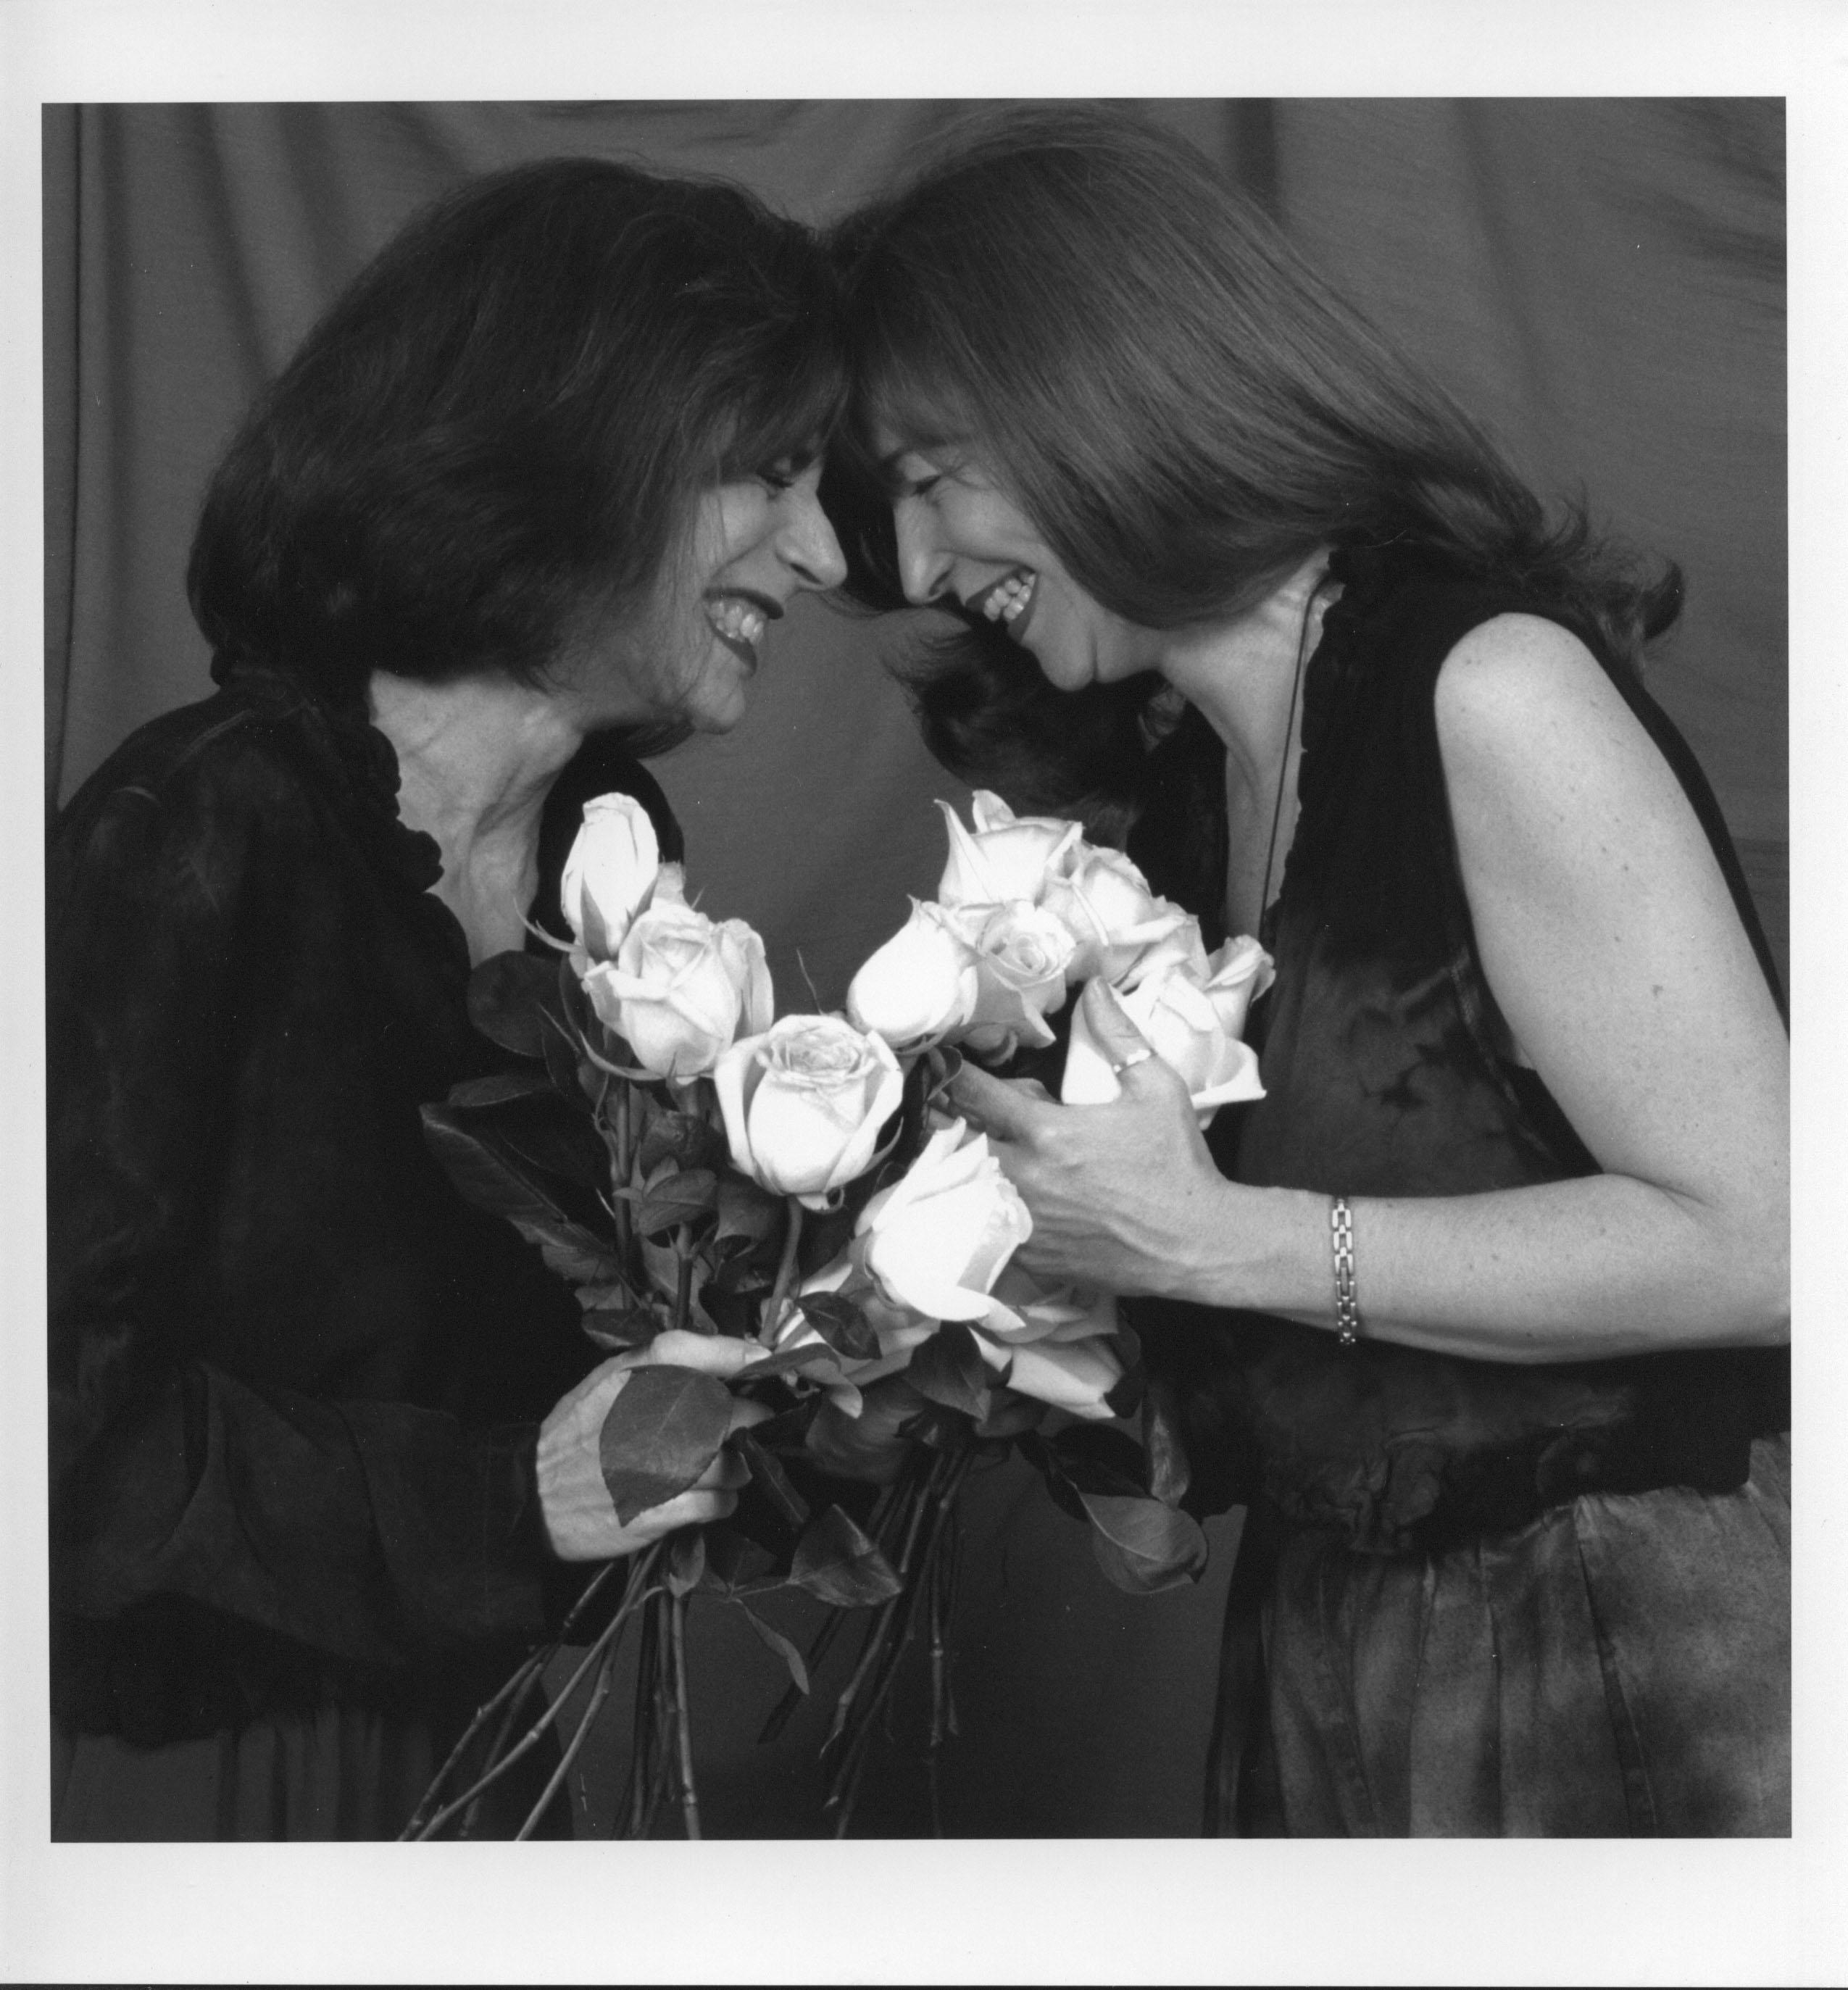 Susan J. Jacks and Rose McGuire in Breathe, 1997